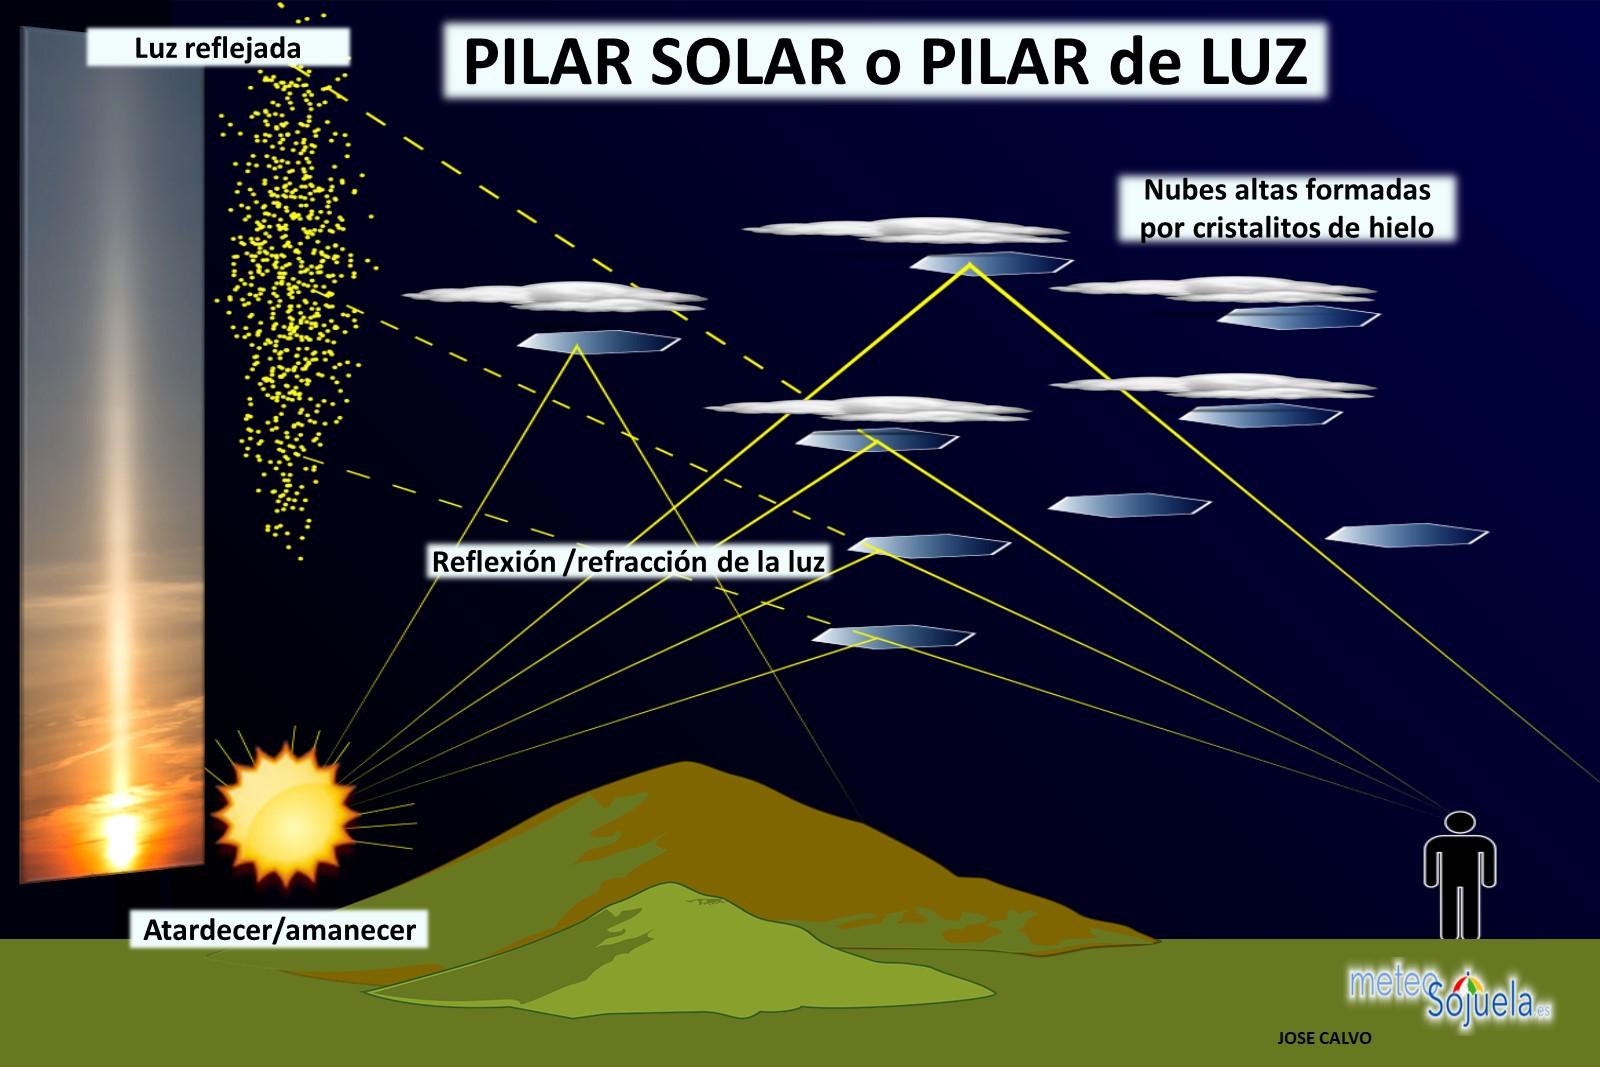 Pilar Solar Meteosojuela